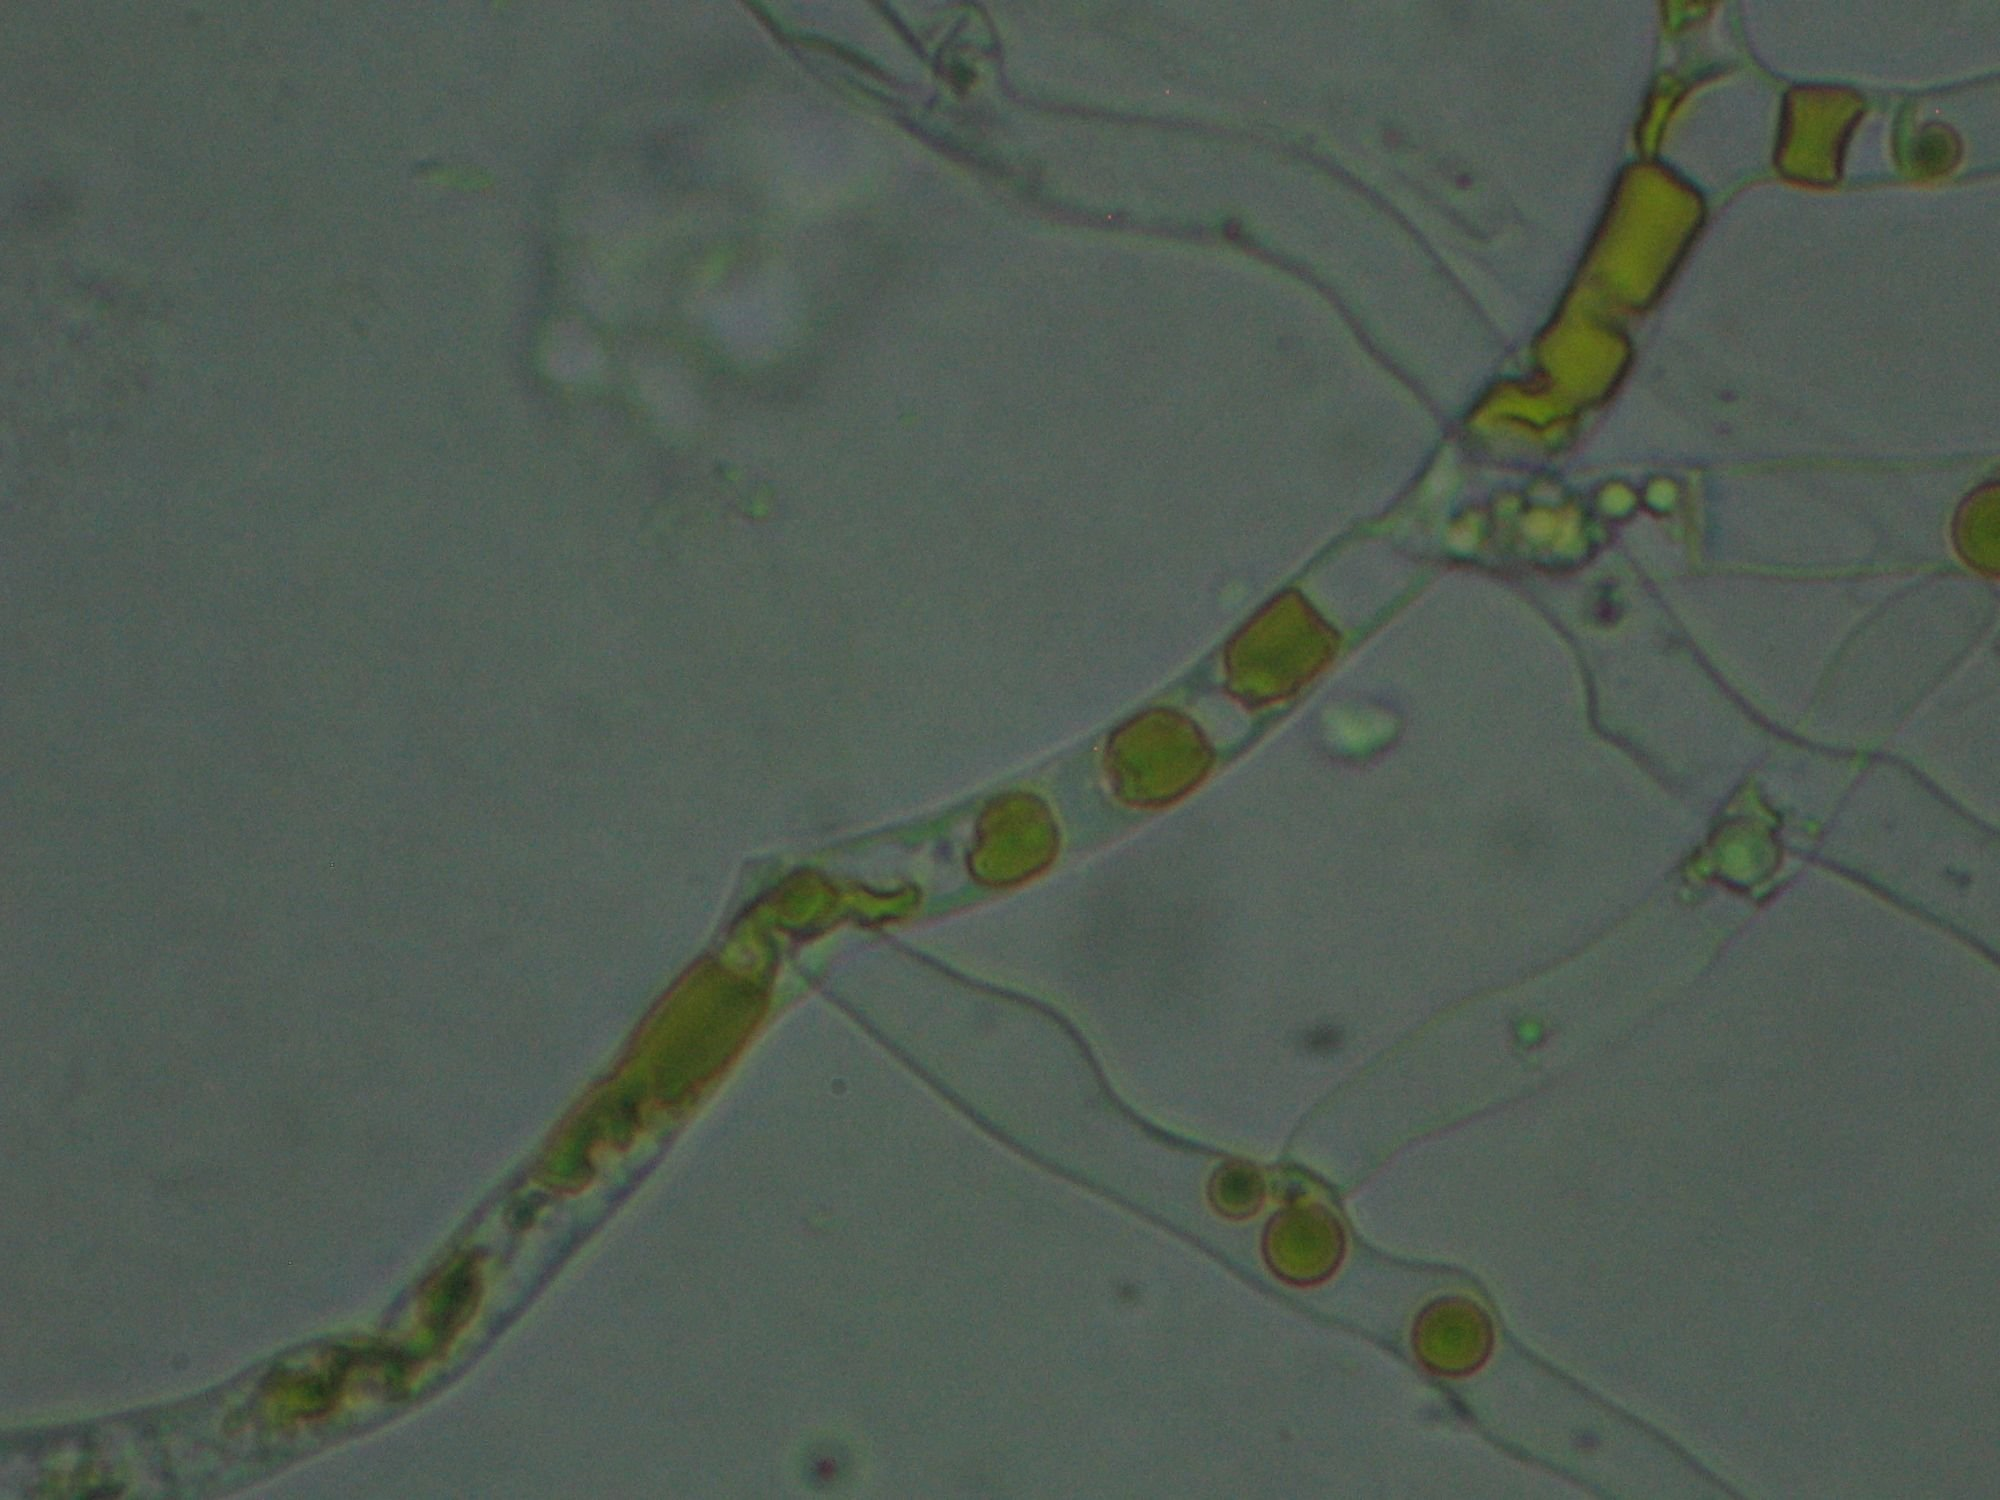 Blakeslea trispora beta-carotene deposits